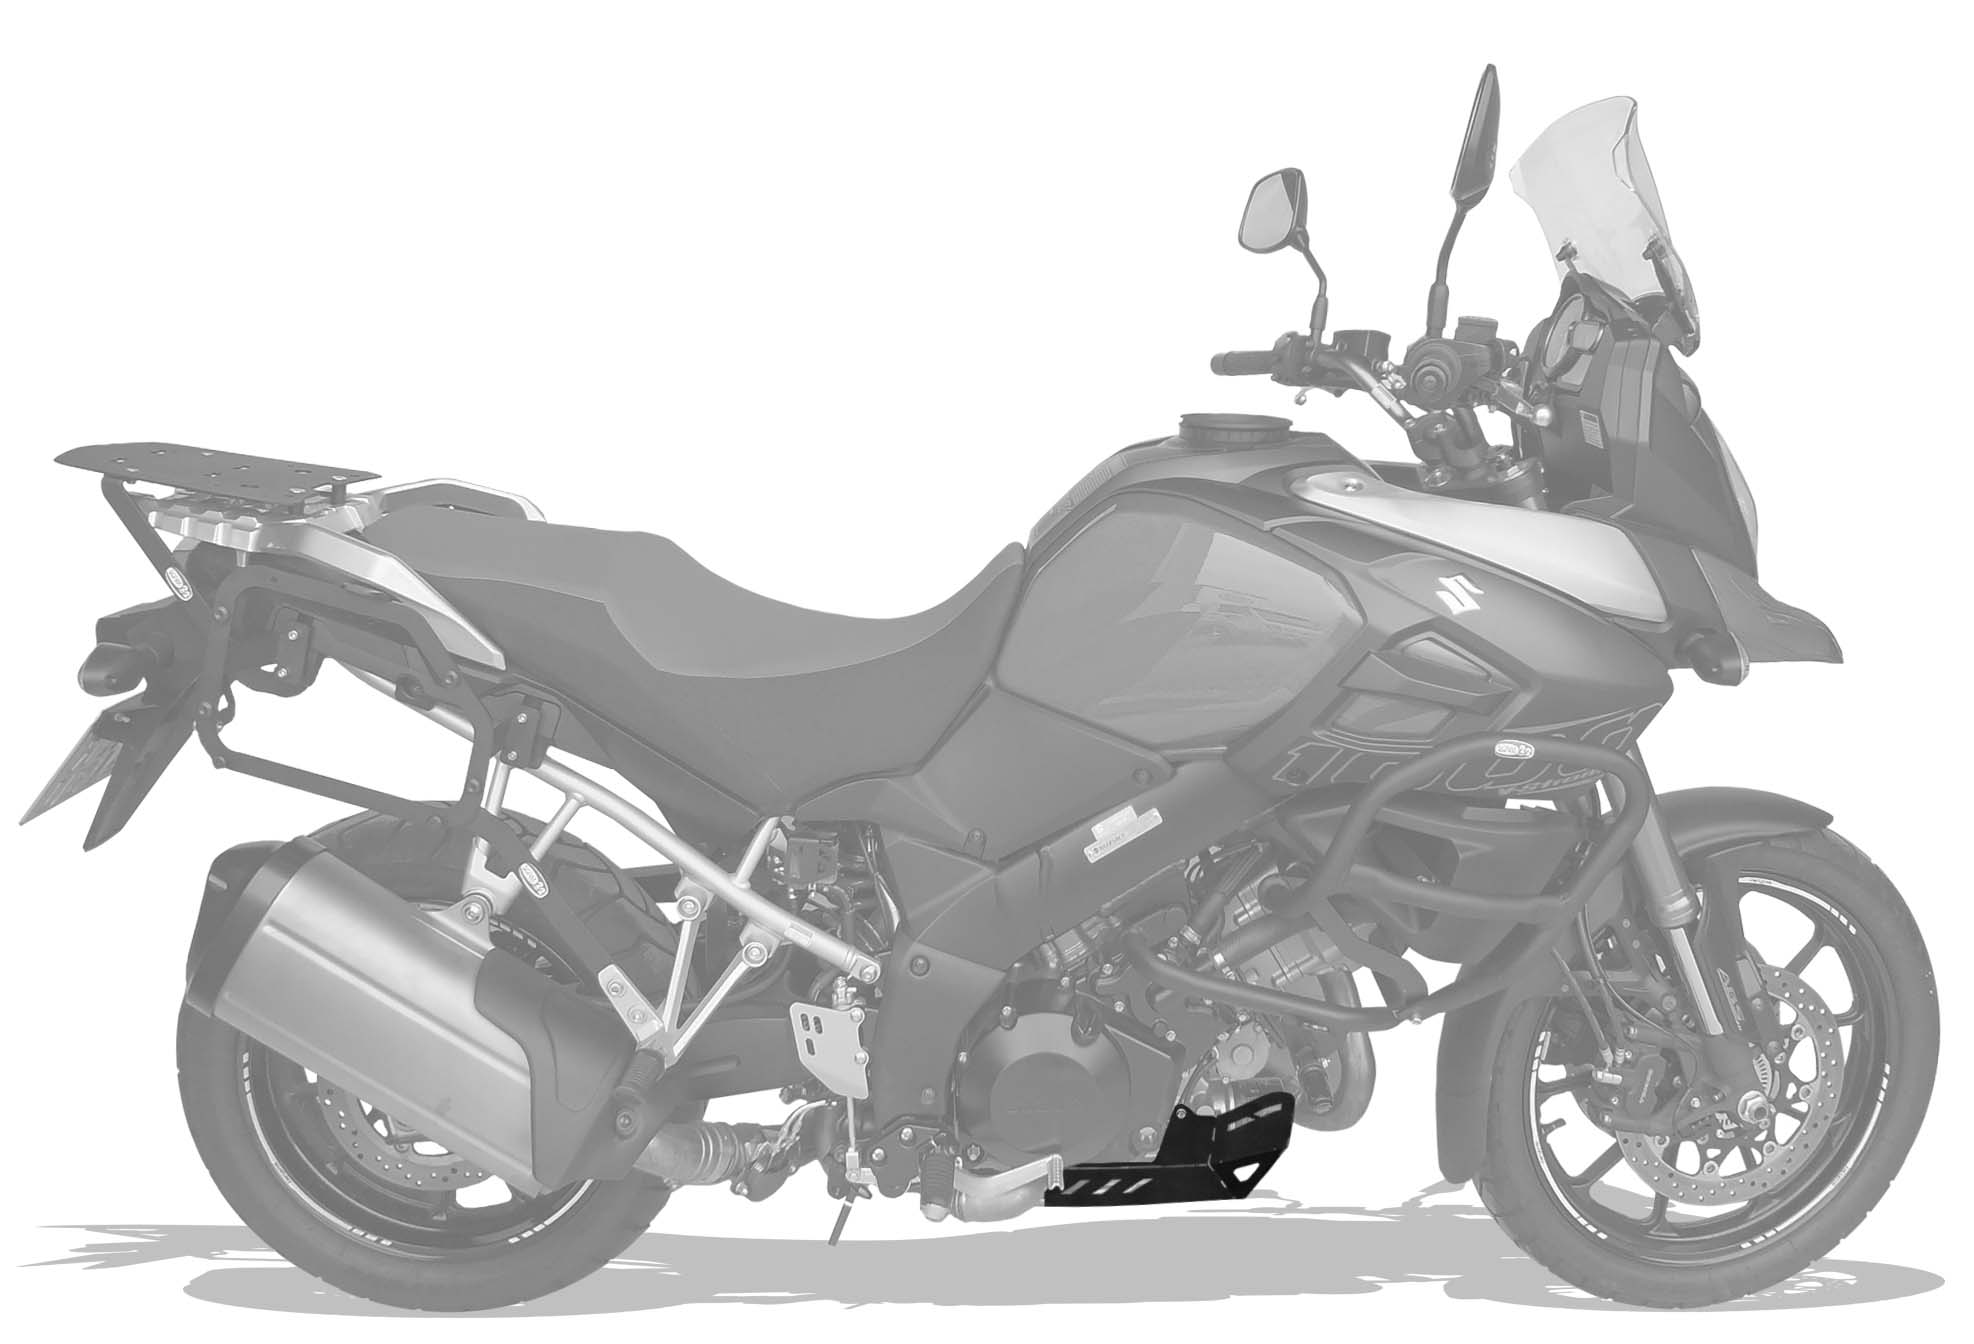 Protetor cárter Suzuki DL Vstrom 1000cc 2014+